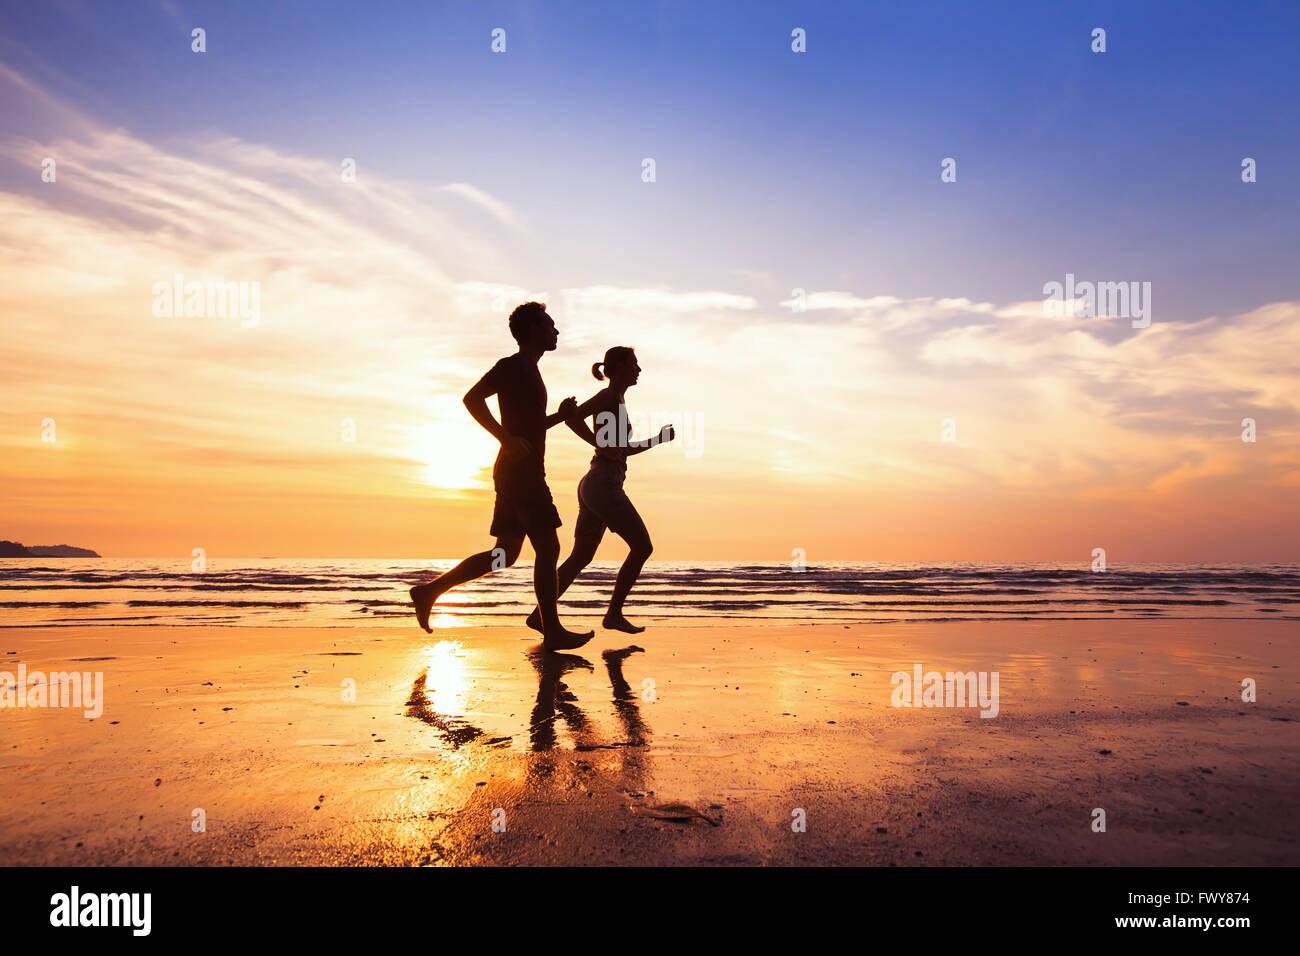 Sport und gesunde Lebensweise, zwei Menschen, Joggen am Strand bei Sonnenuntergang Stockbild